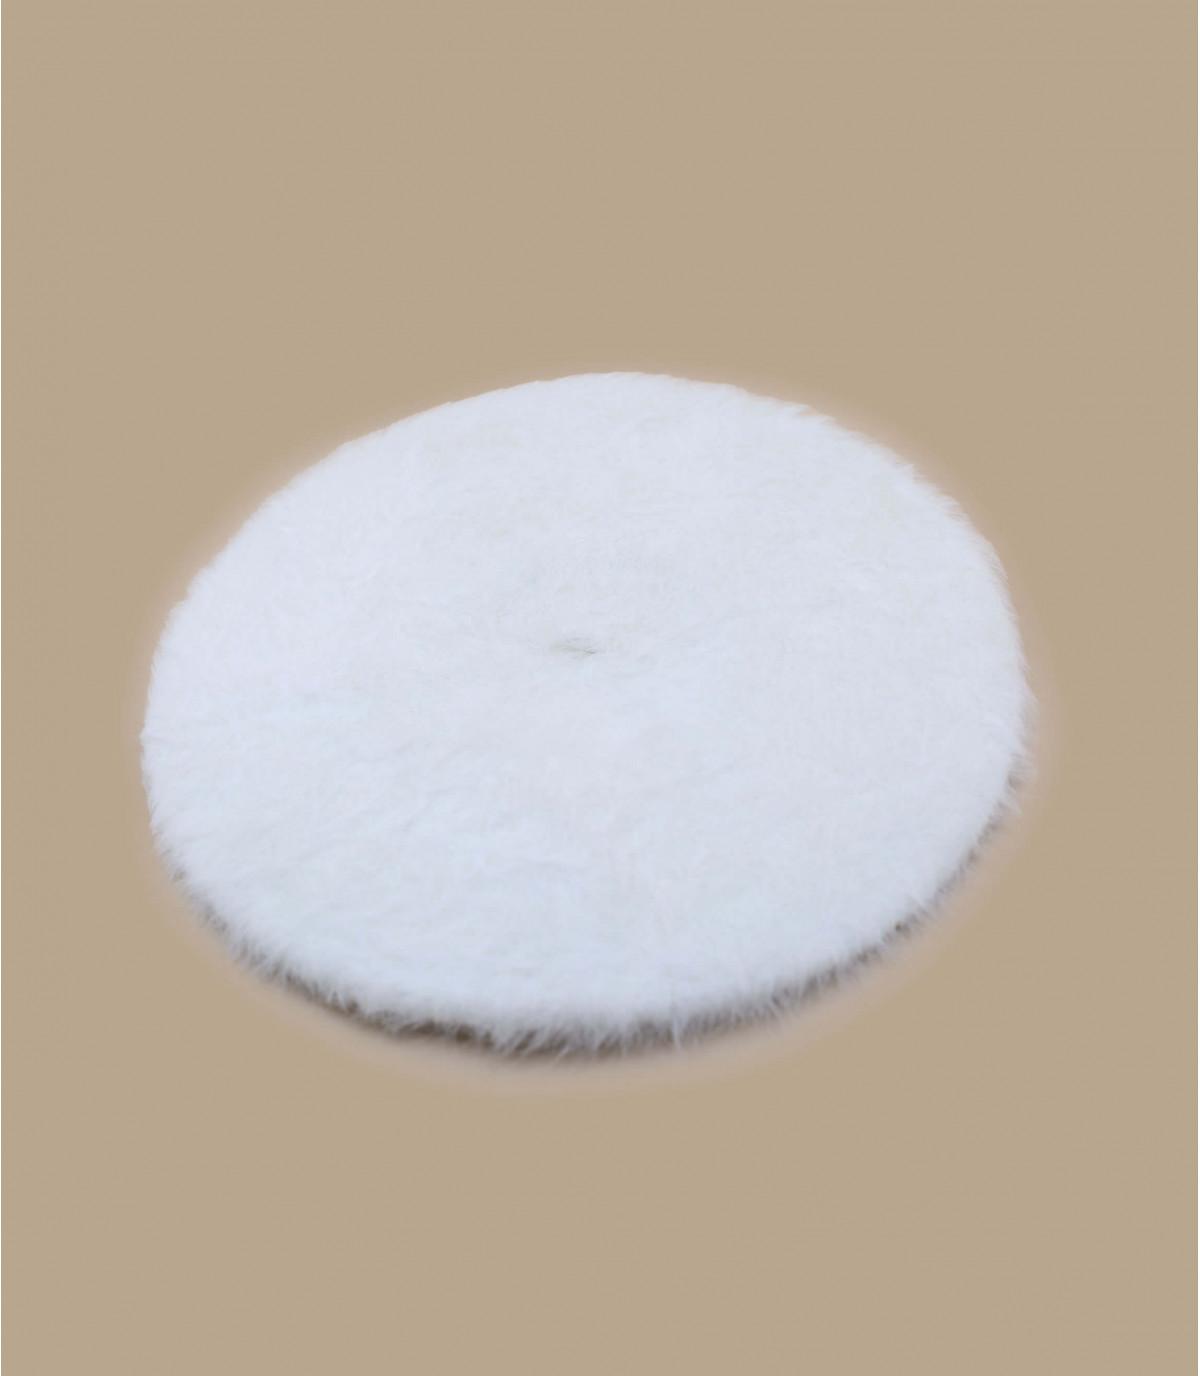 white angora beret Laulhère